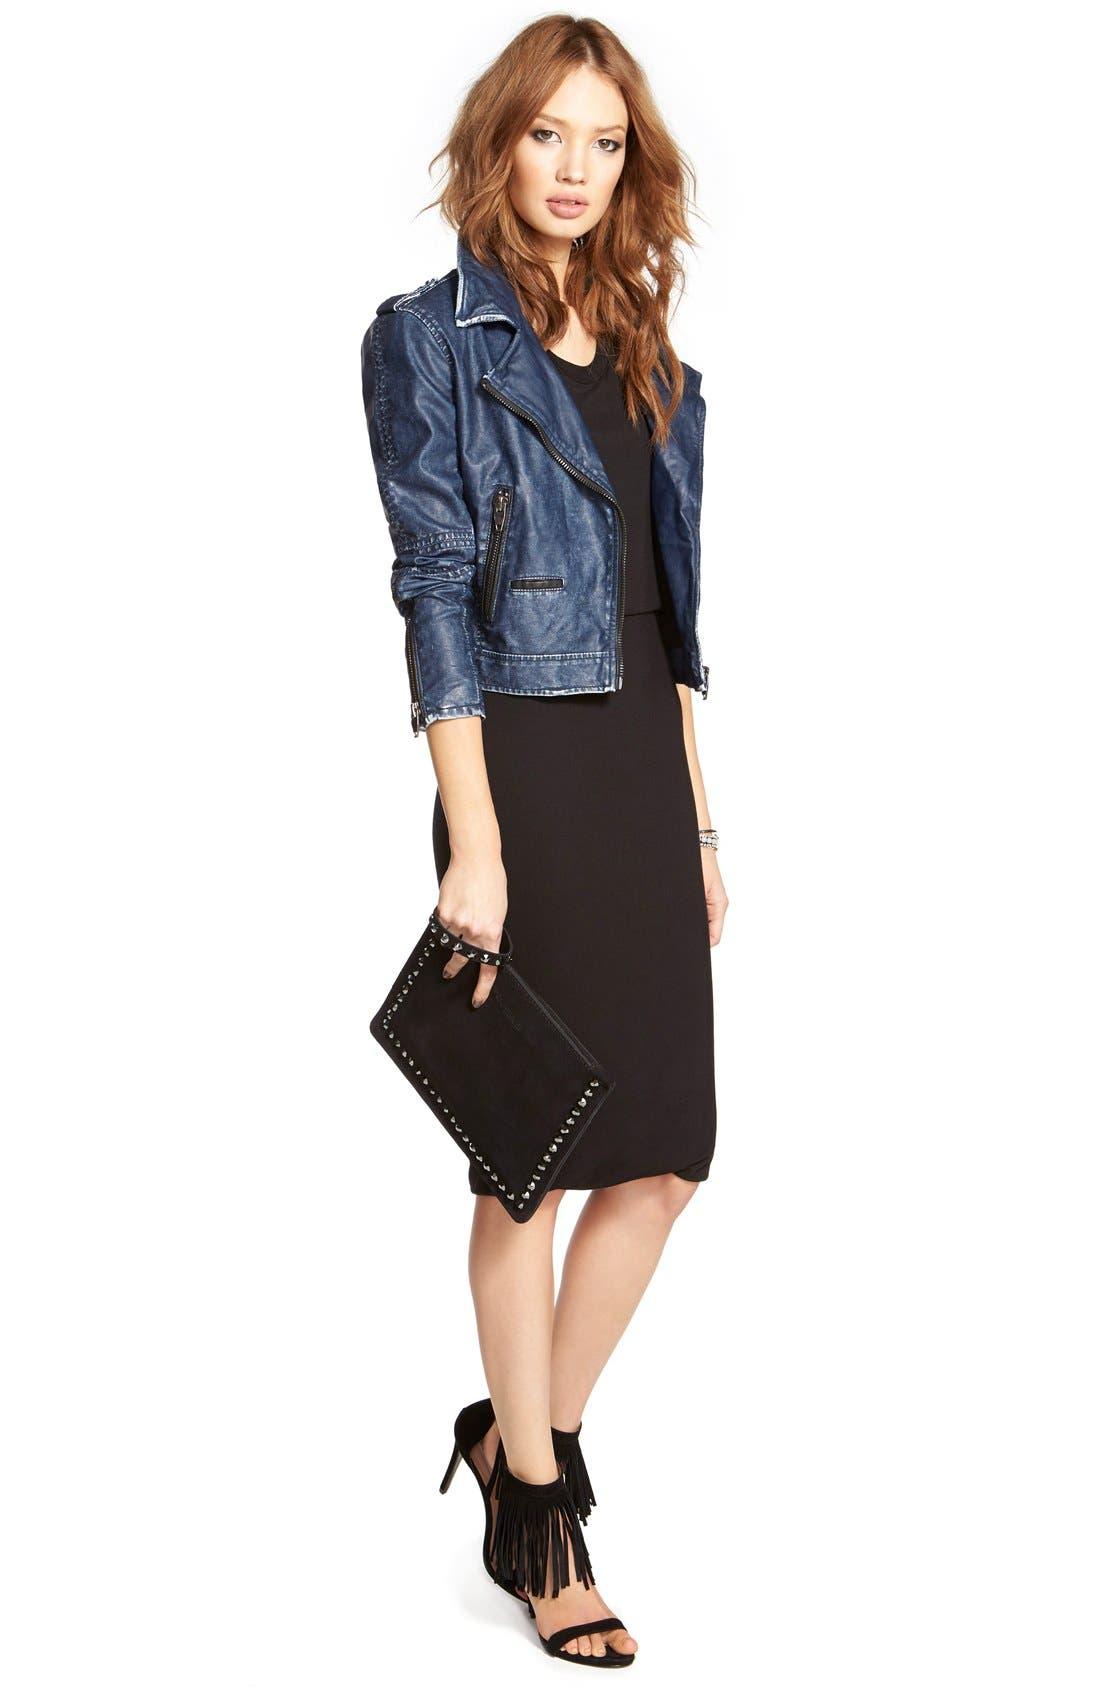 BLANKNYC Jacket & Leith Dress